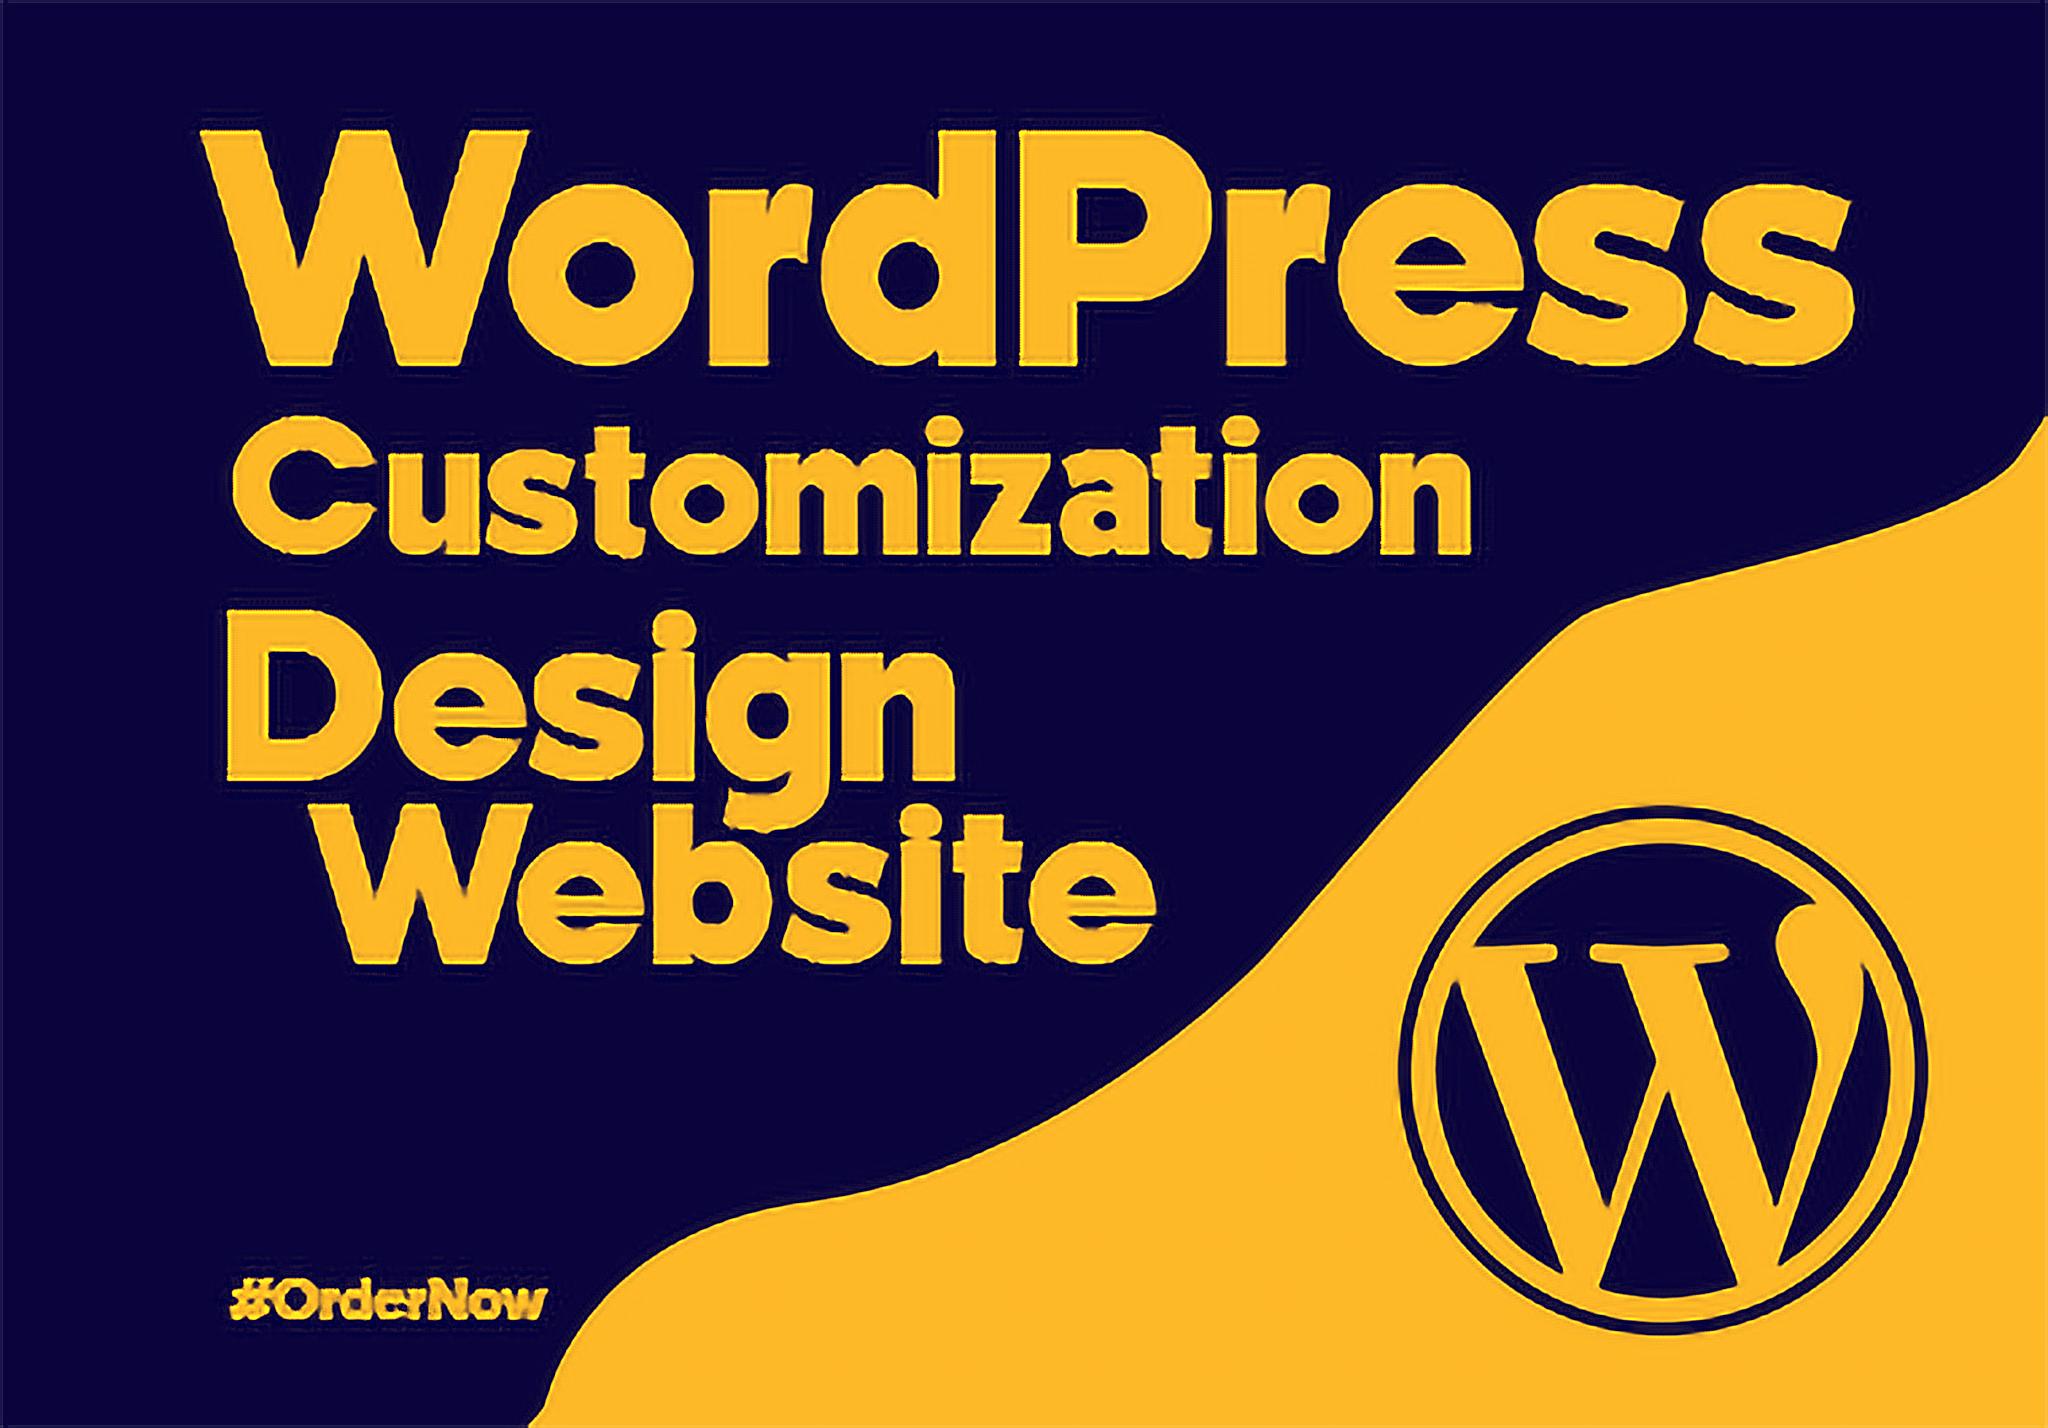 Professional Responsive WordPress Website Design & Customization